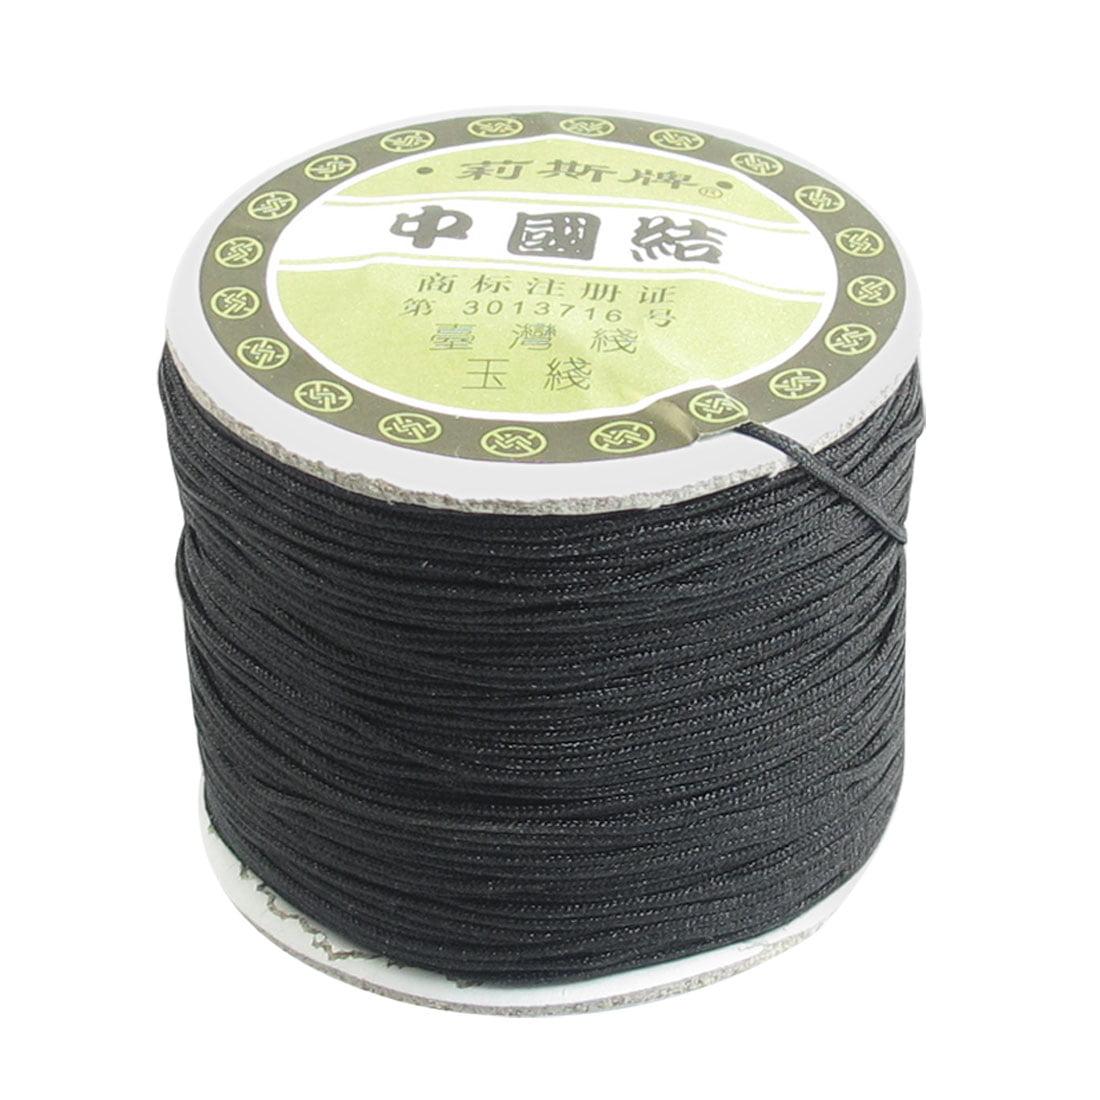 Unique Bargains 1mm Bracelet Braided Rope Nylon Black Rat Tail Cord 150 Meters